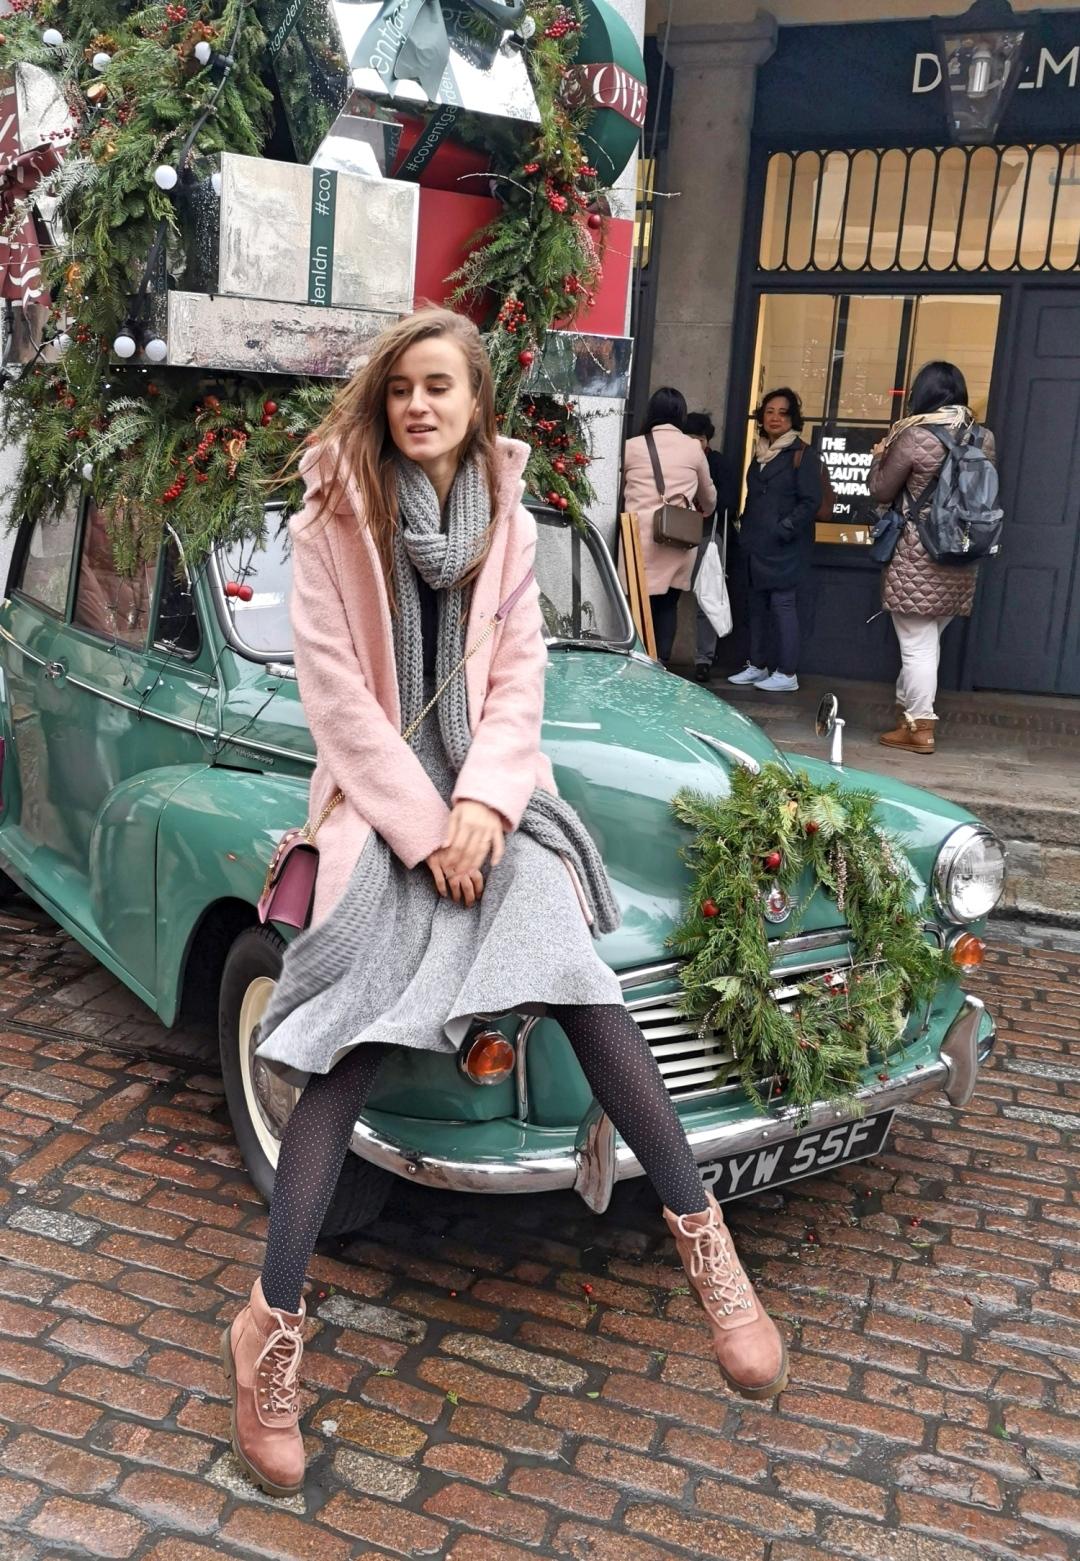 Covent Garden London - Christmas car Winter 2018